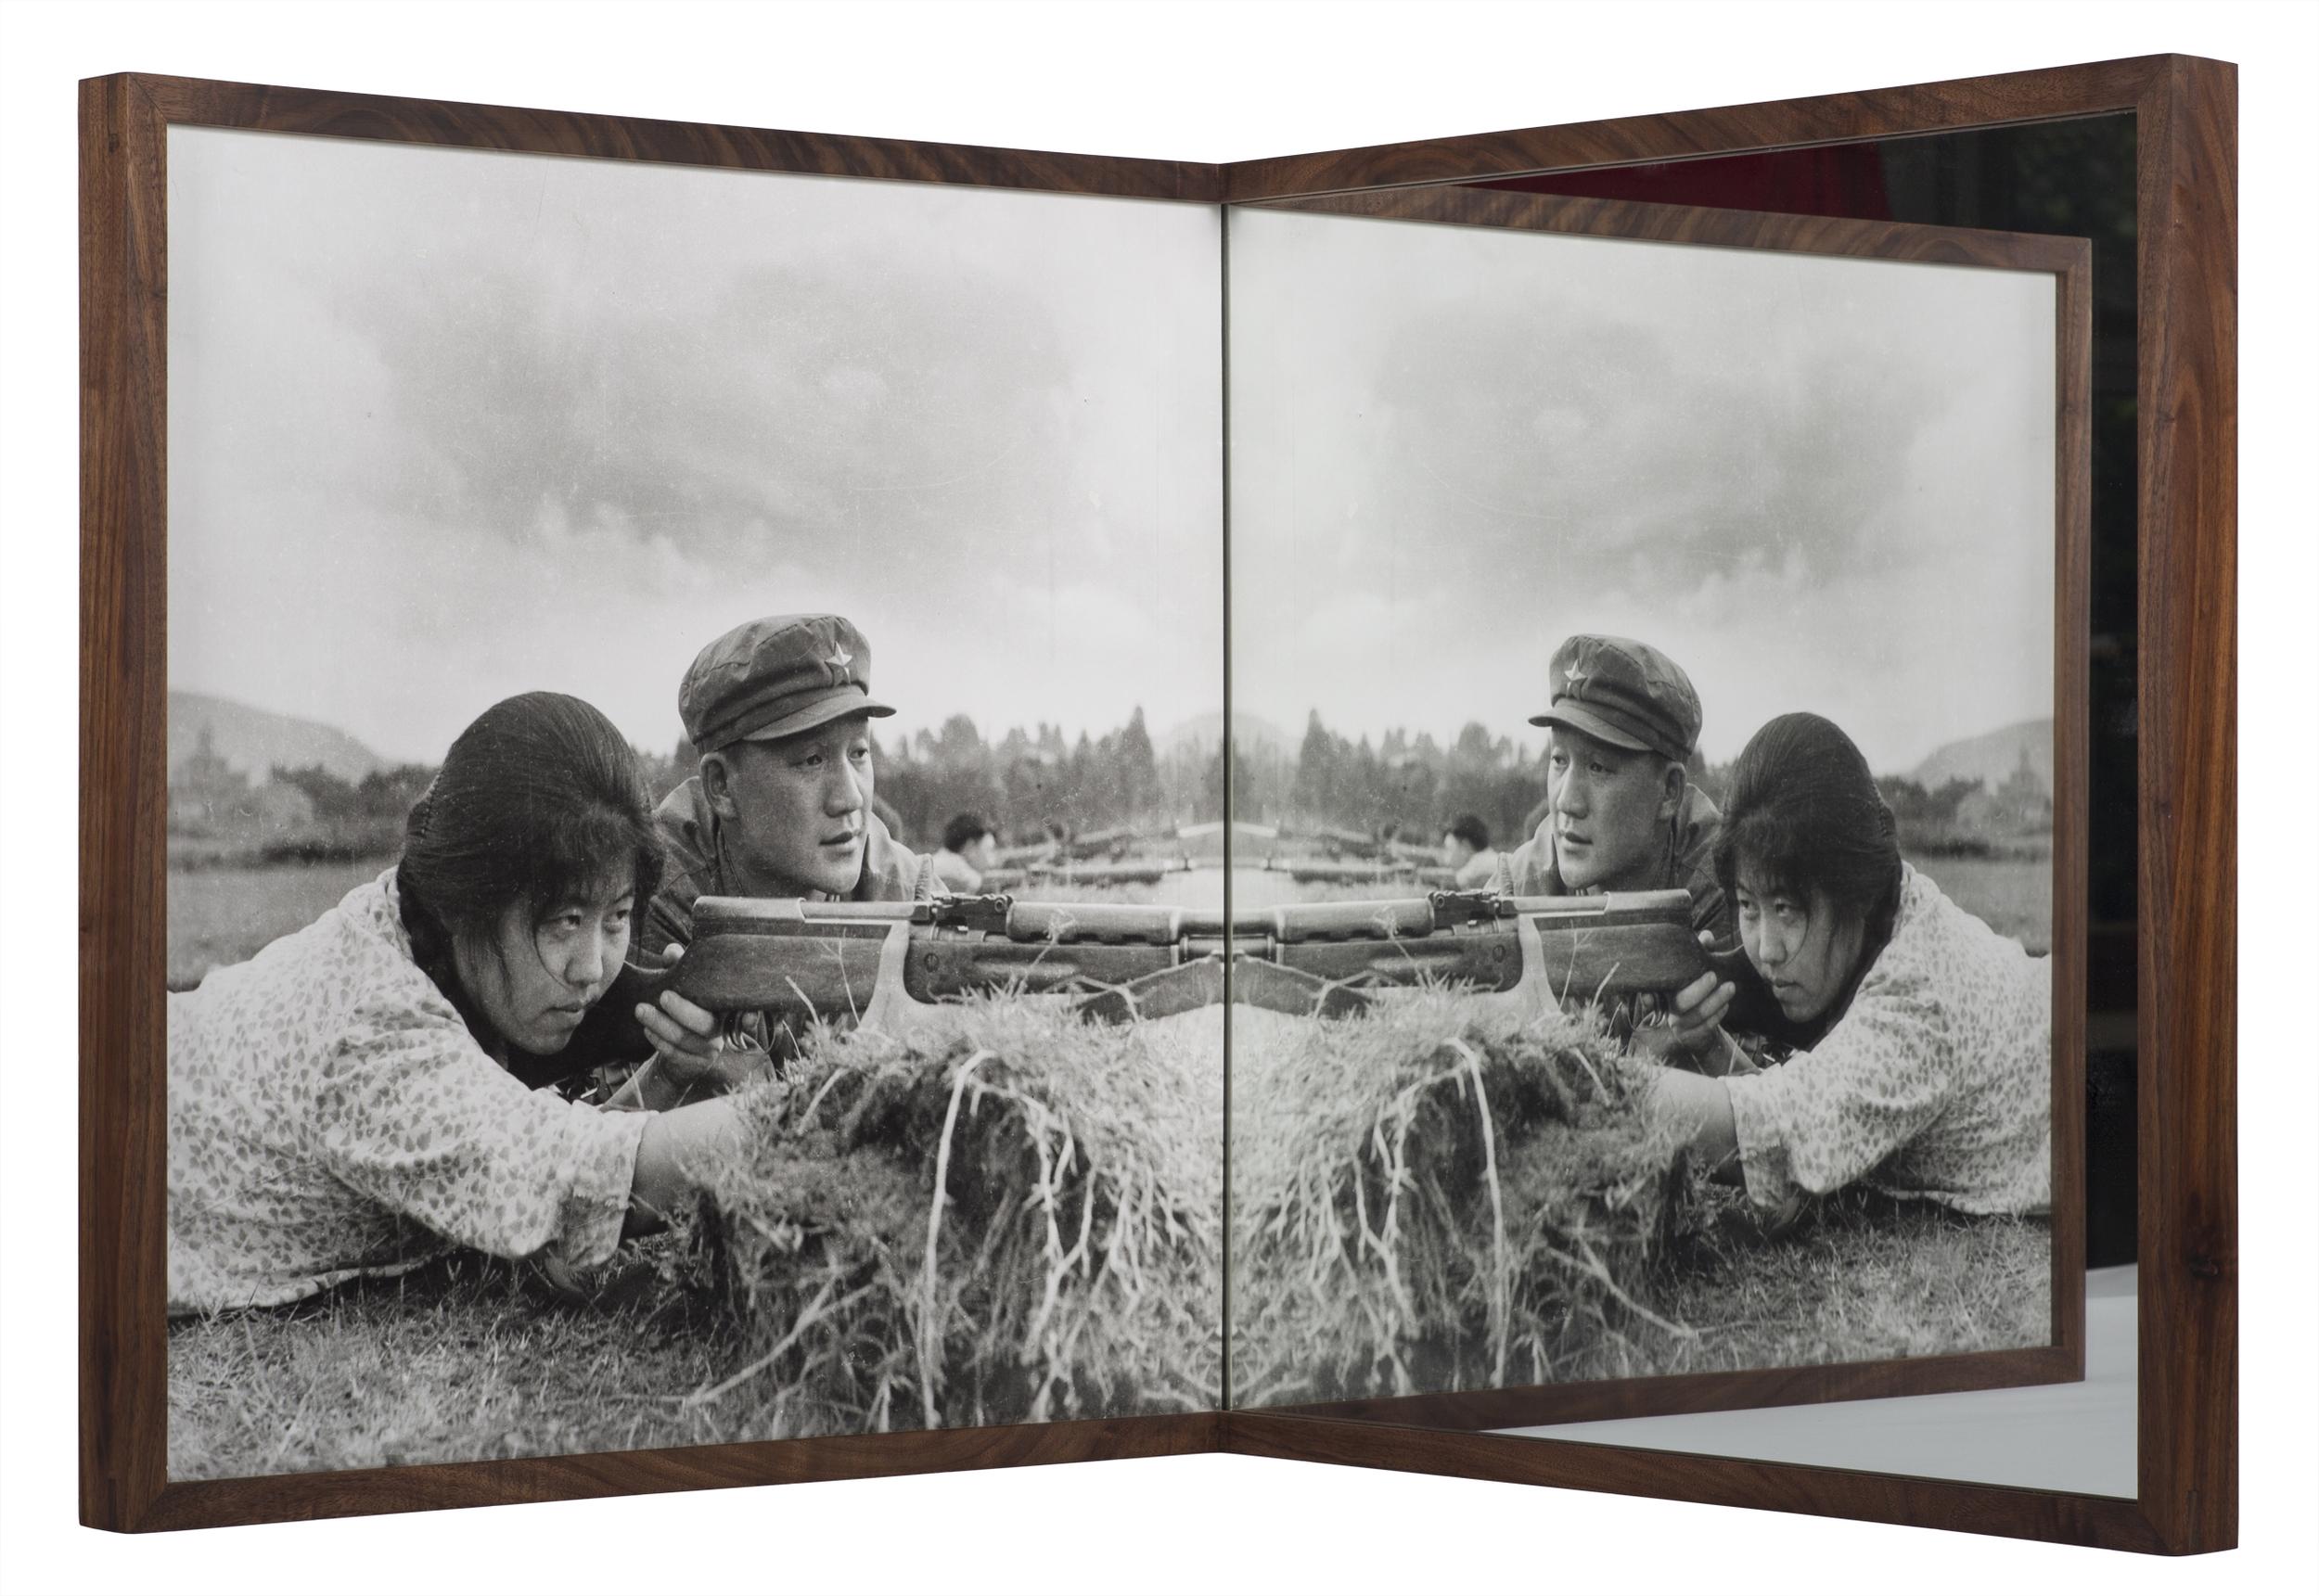 Cai_Dongdong_Practice_Shooting_silver_gelatin_print_mirror_53x53x53_2015